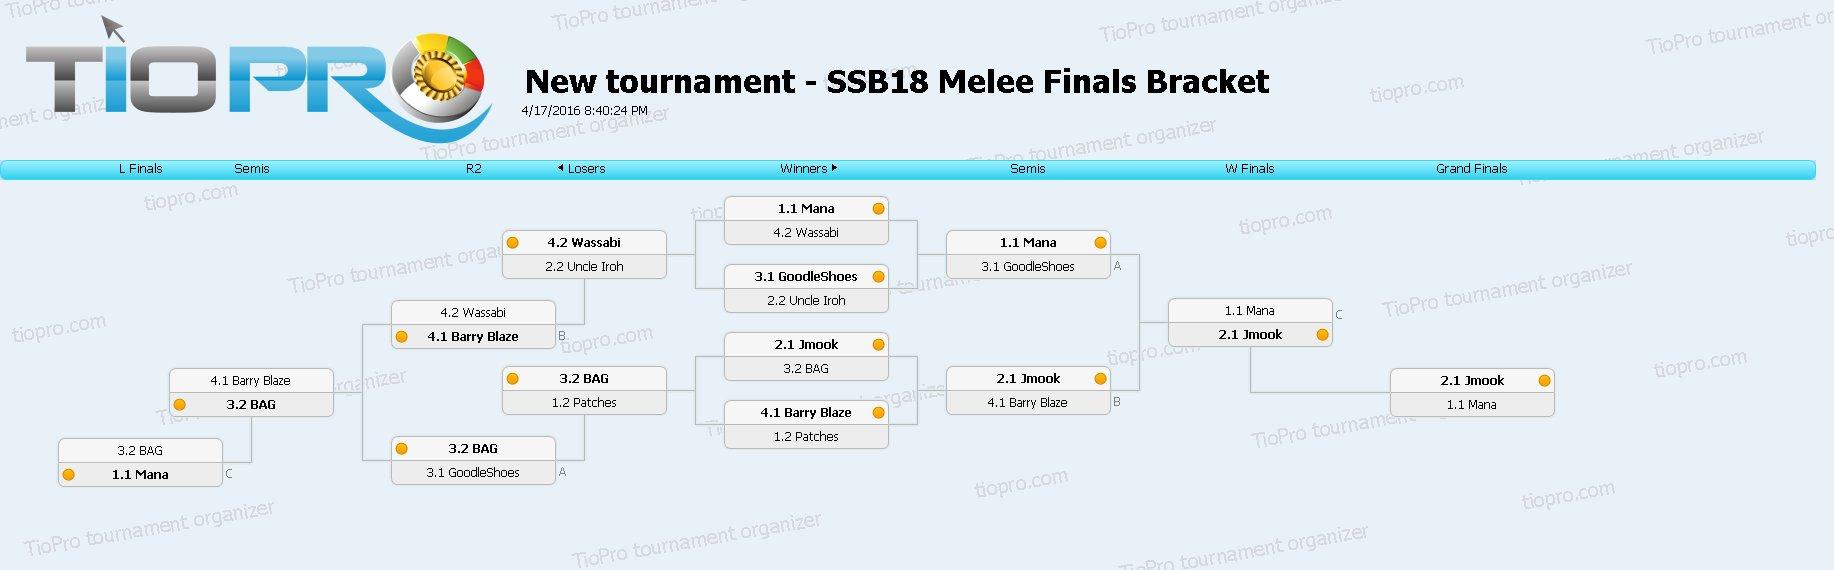 SSB18 Melee Finals Bracket